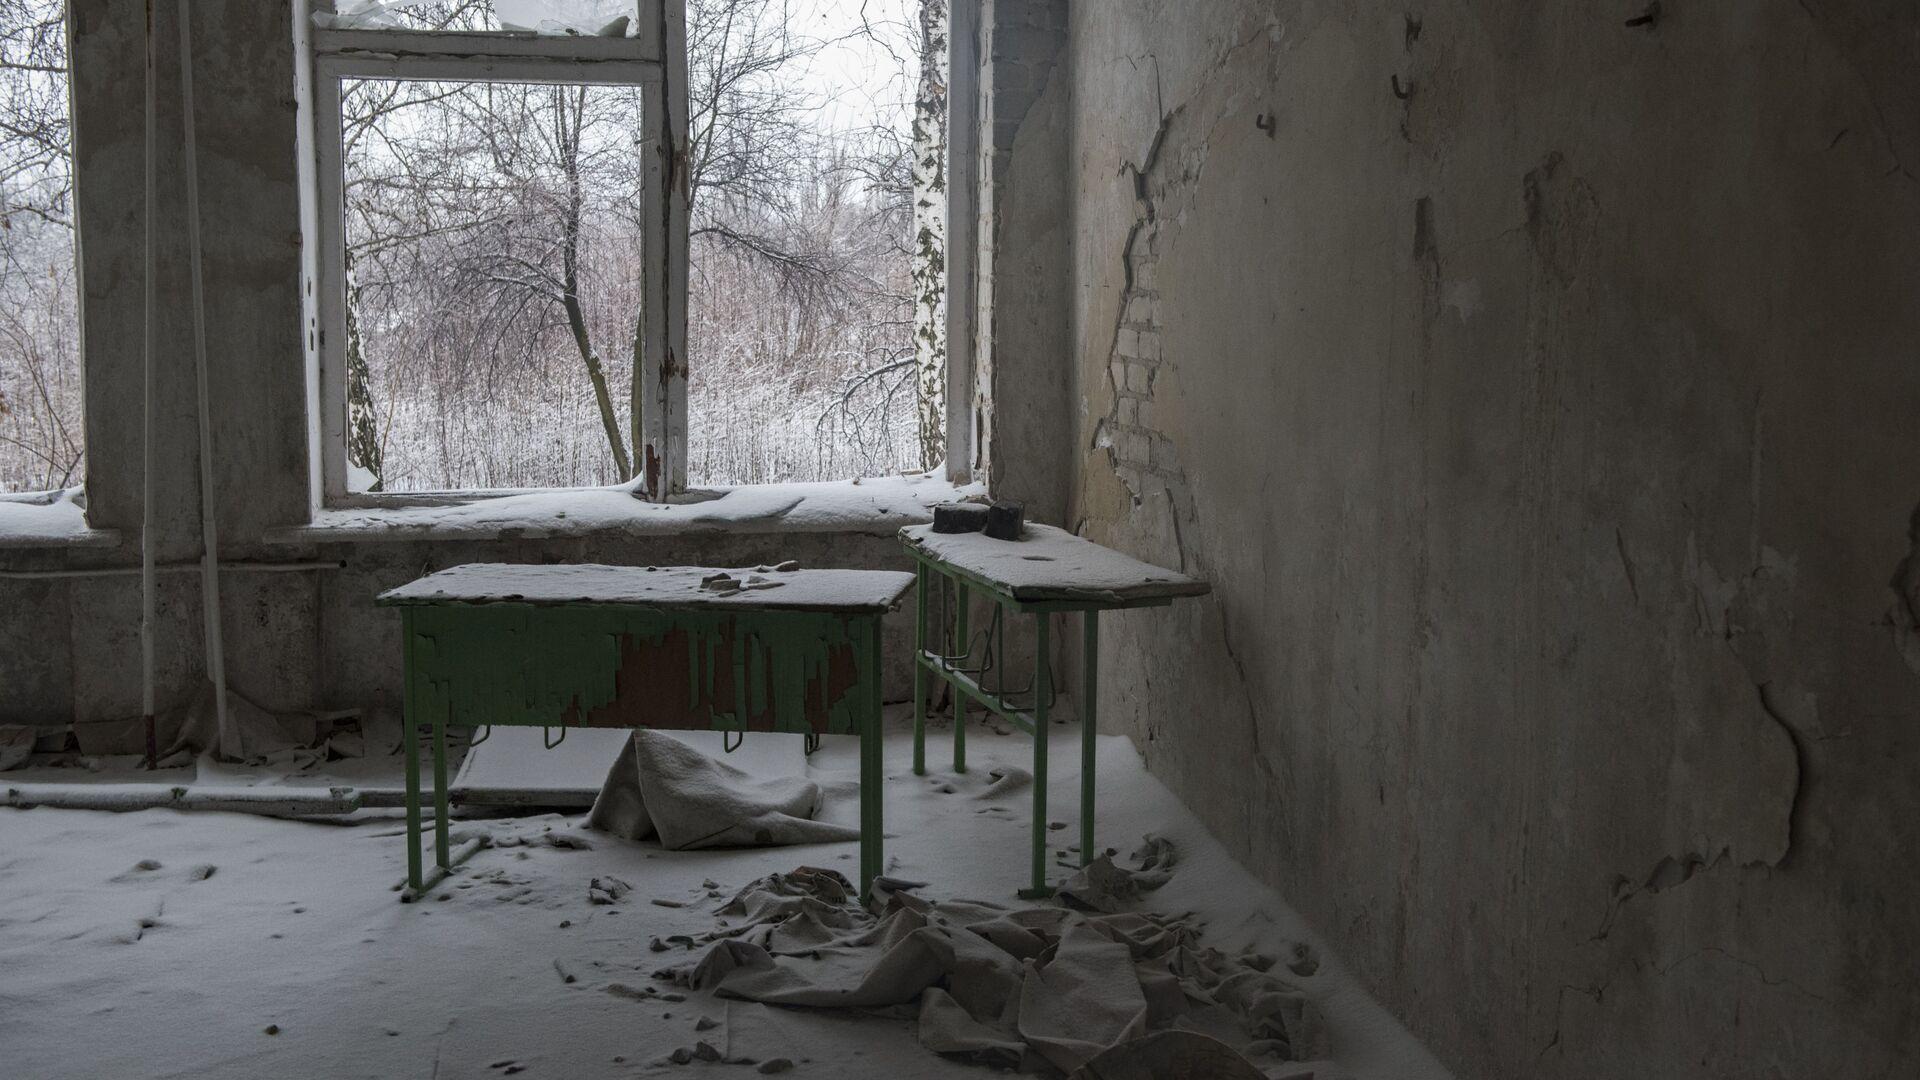 Konflikt zbrojny w Donbasie - Sputnik Polska, 1920, 10.04.2021